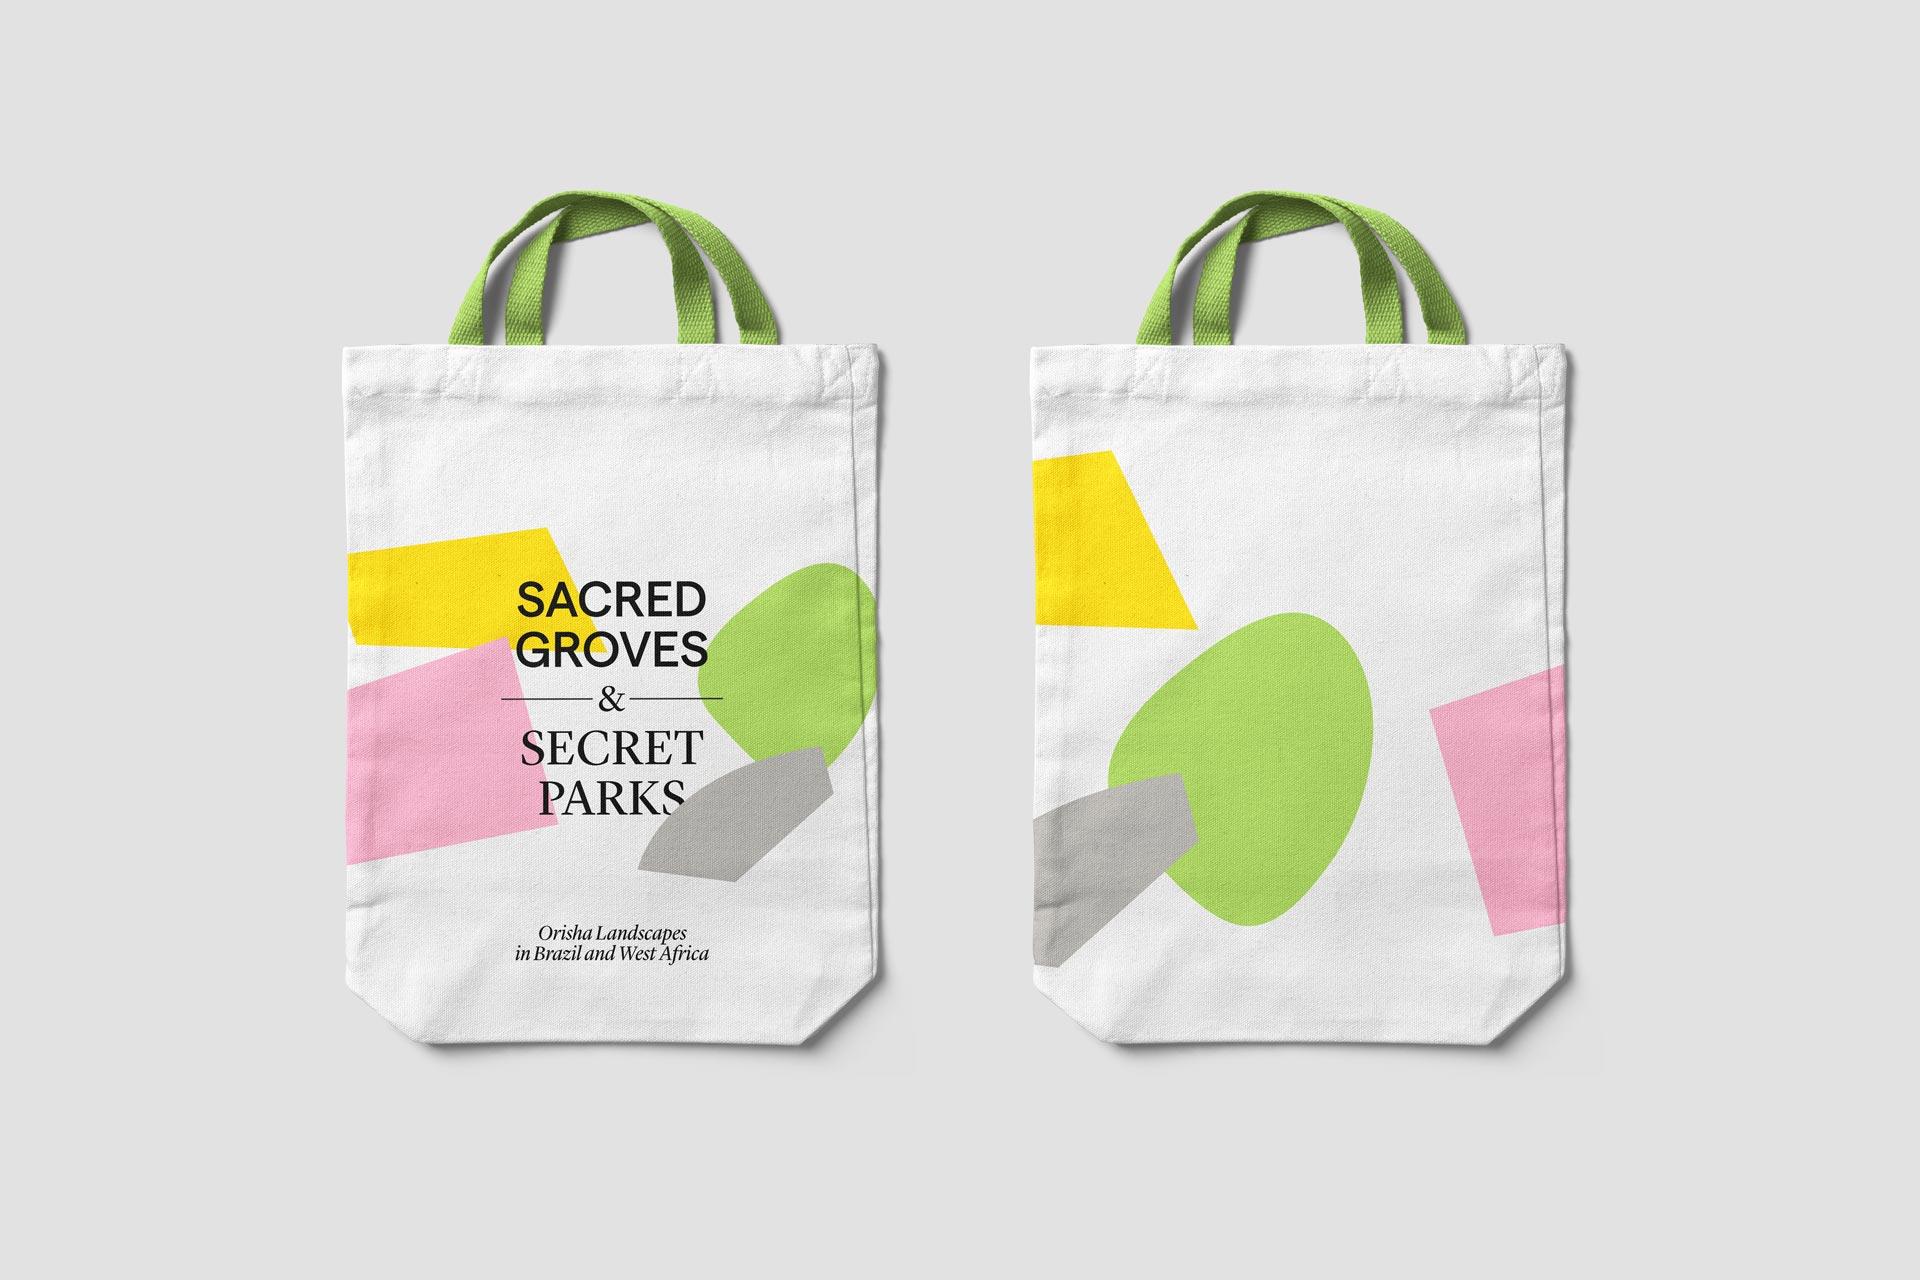 Sacred Groves & Secret Parks